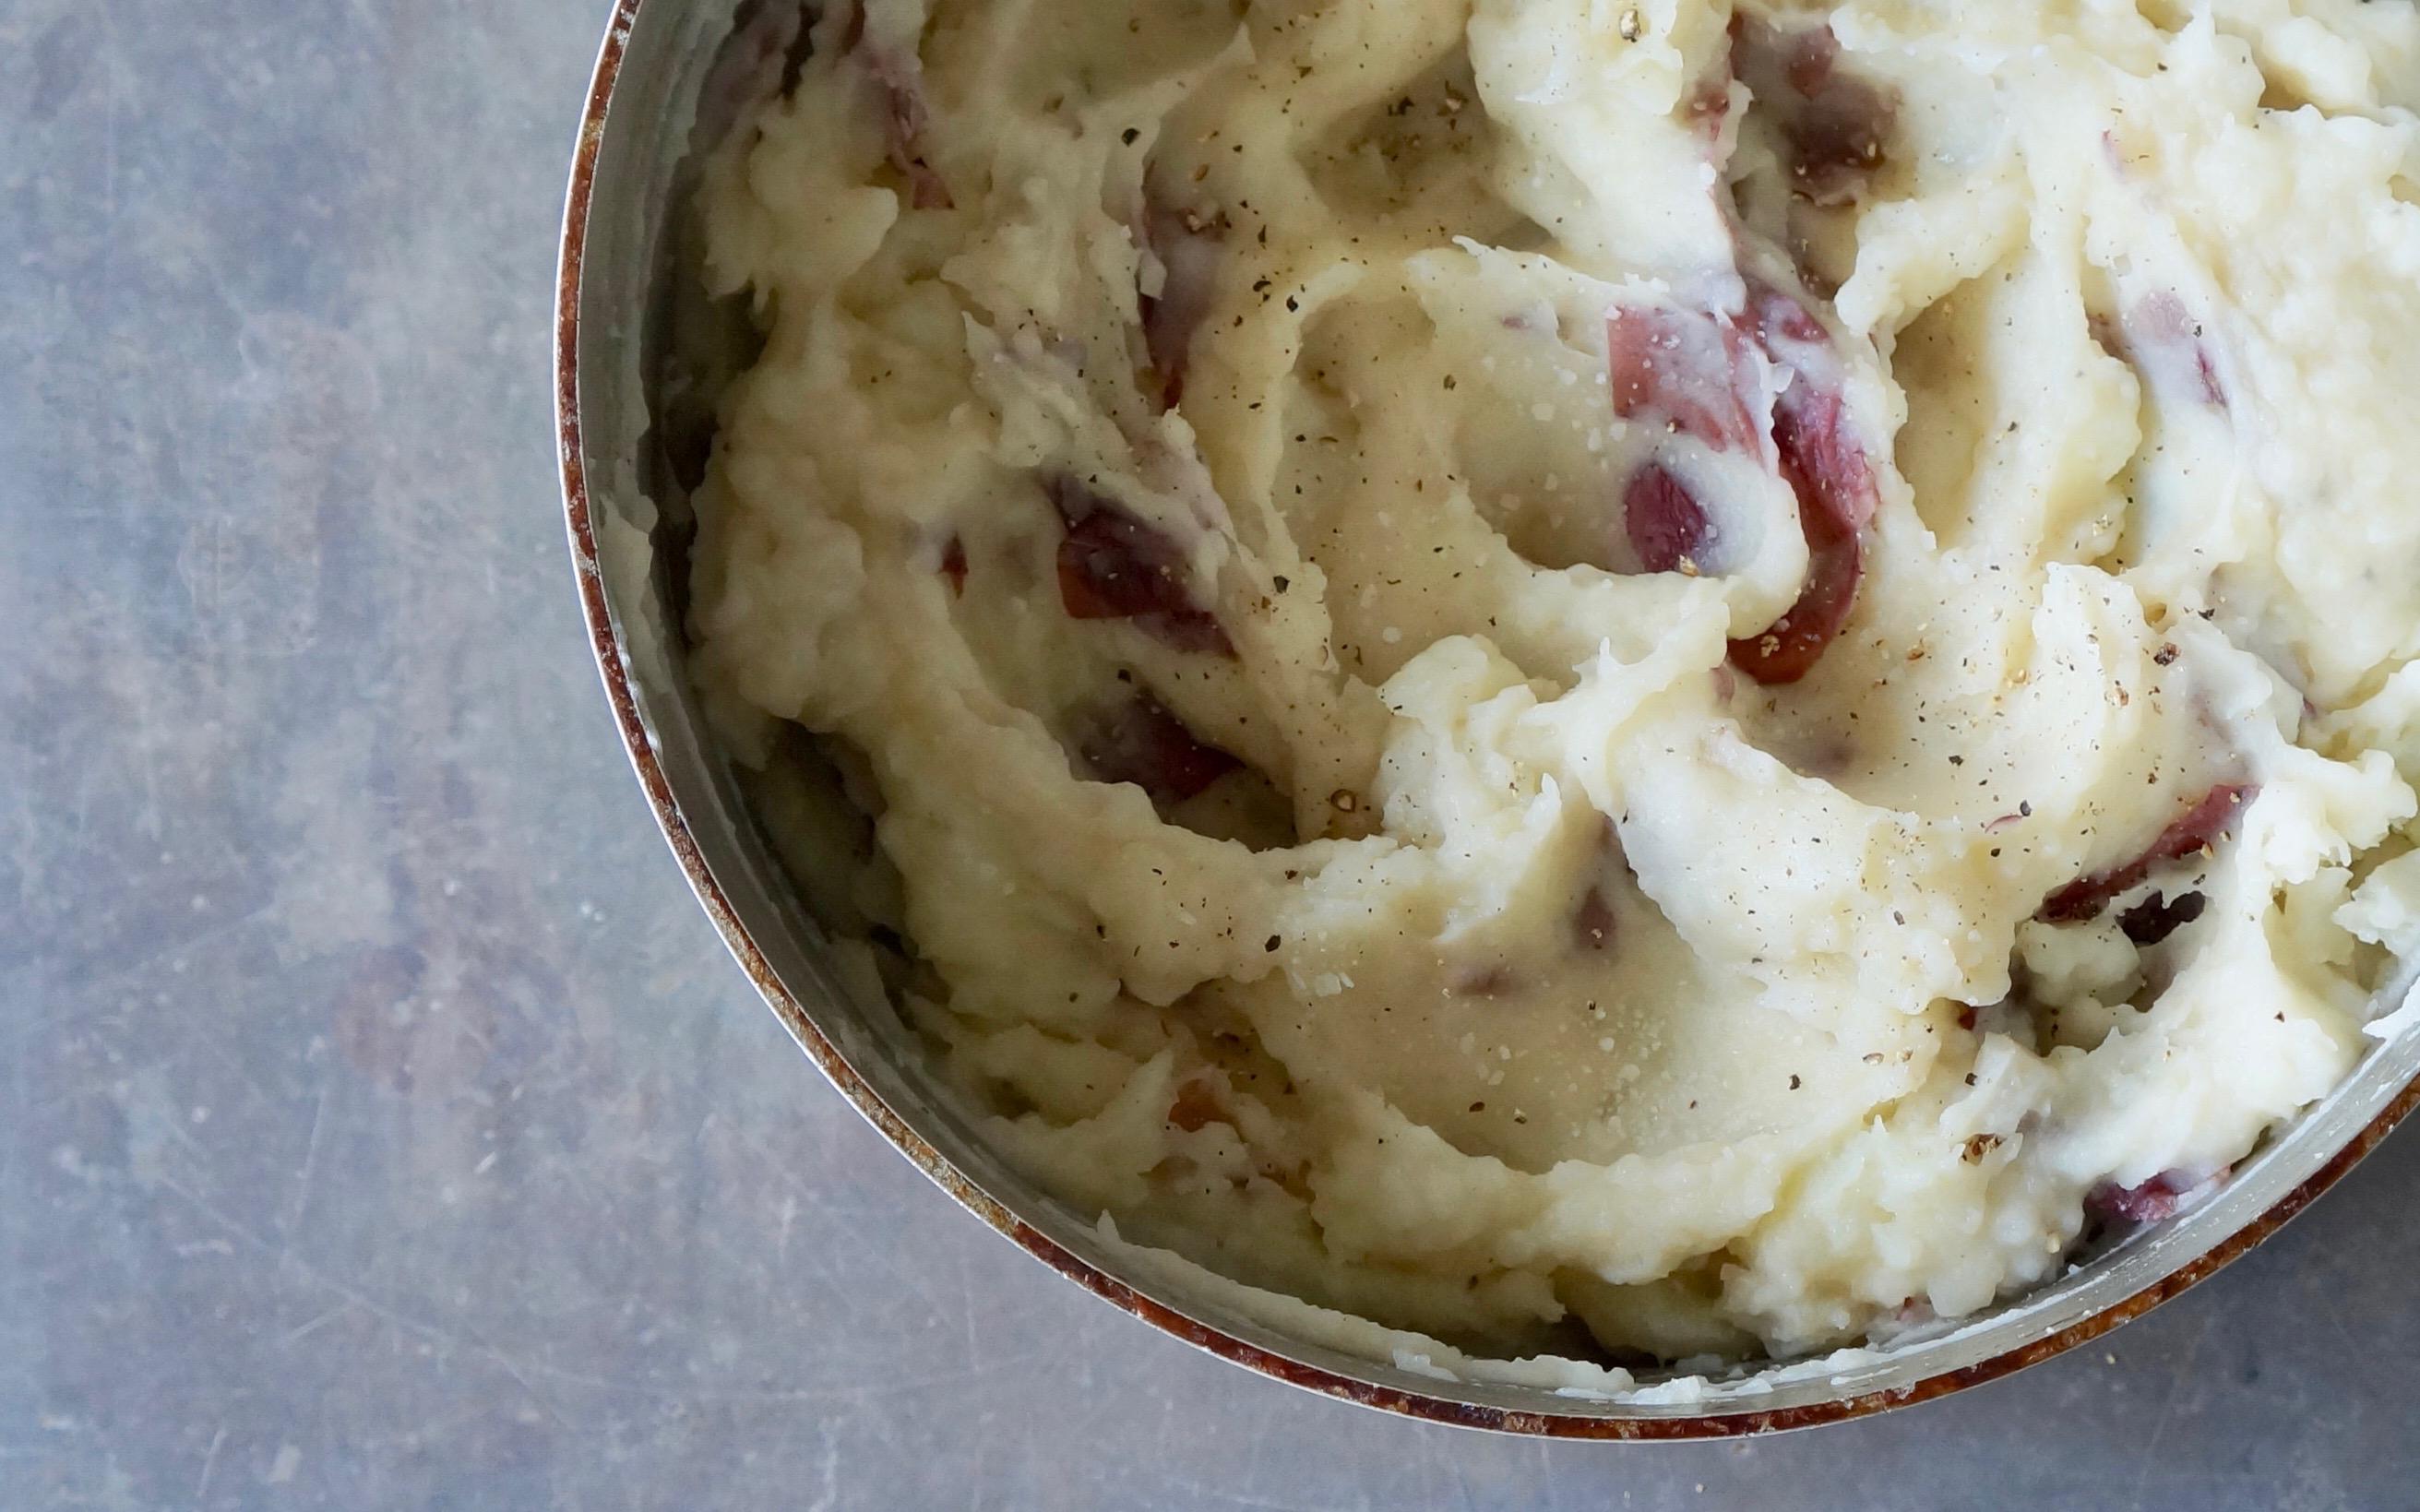 Classics-Mashed-Potatoes-How To Boil-Rebecca-Gordon-Publisher-Buttermilk-Lipstick-Culinary-Entertaining-Techniques-Southern-Hostess-RebeccaGordon-Pastry-Chef-Birmingham-Alabama